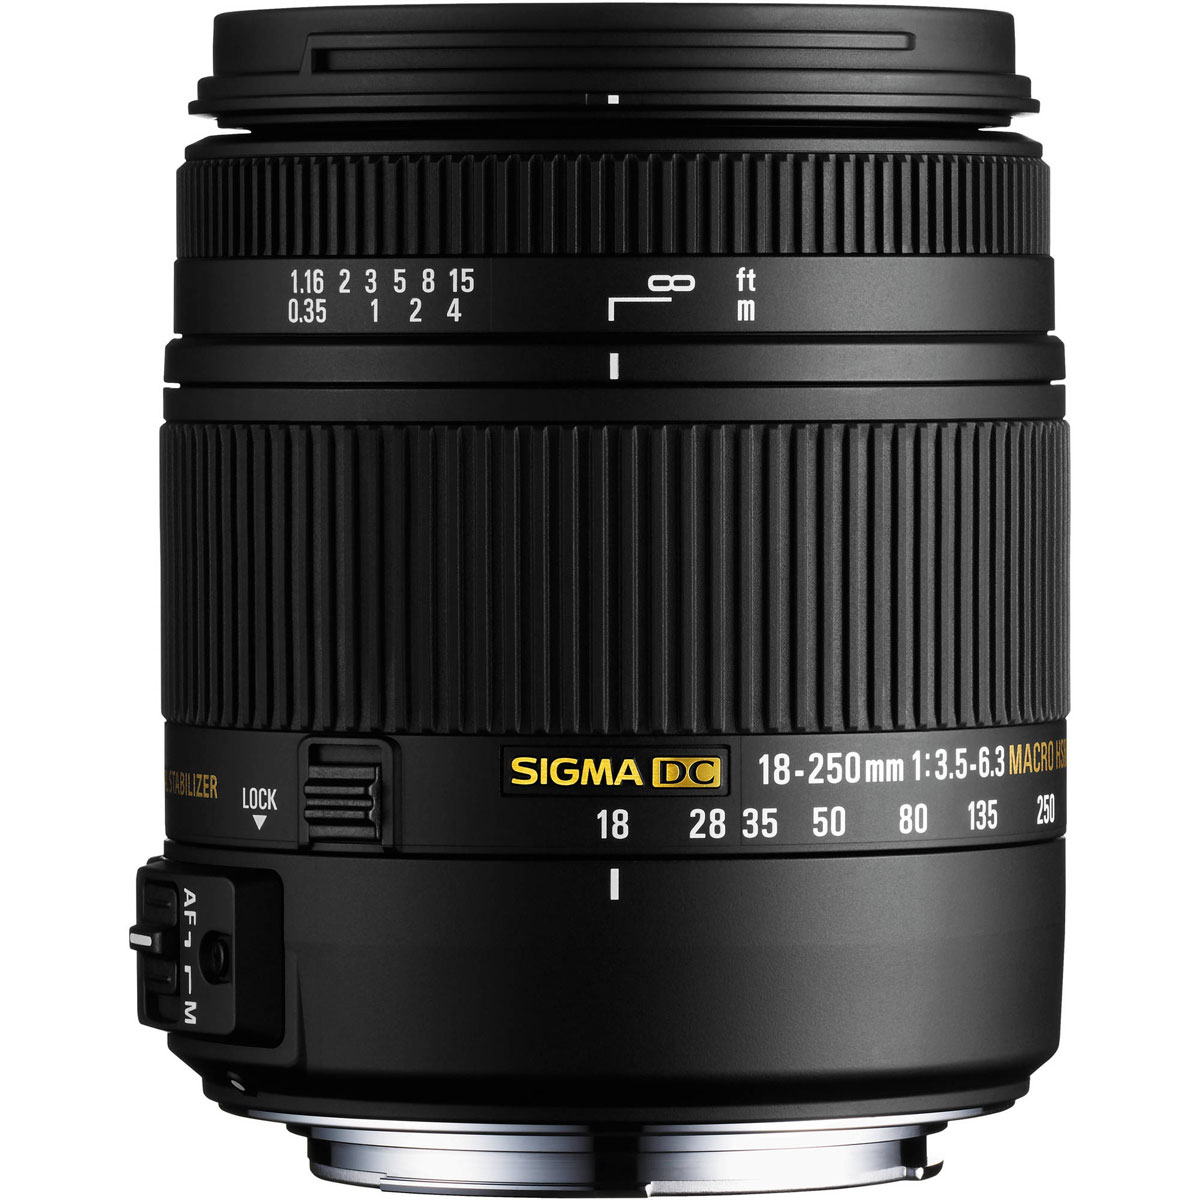 SigmaAF18-250mmF3.5-6.3DCMACROOSHSM, Black объектив для Nikon